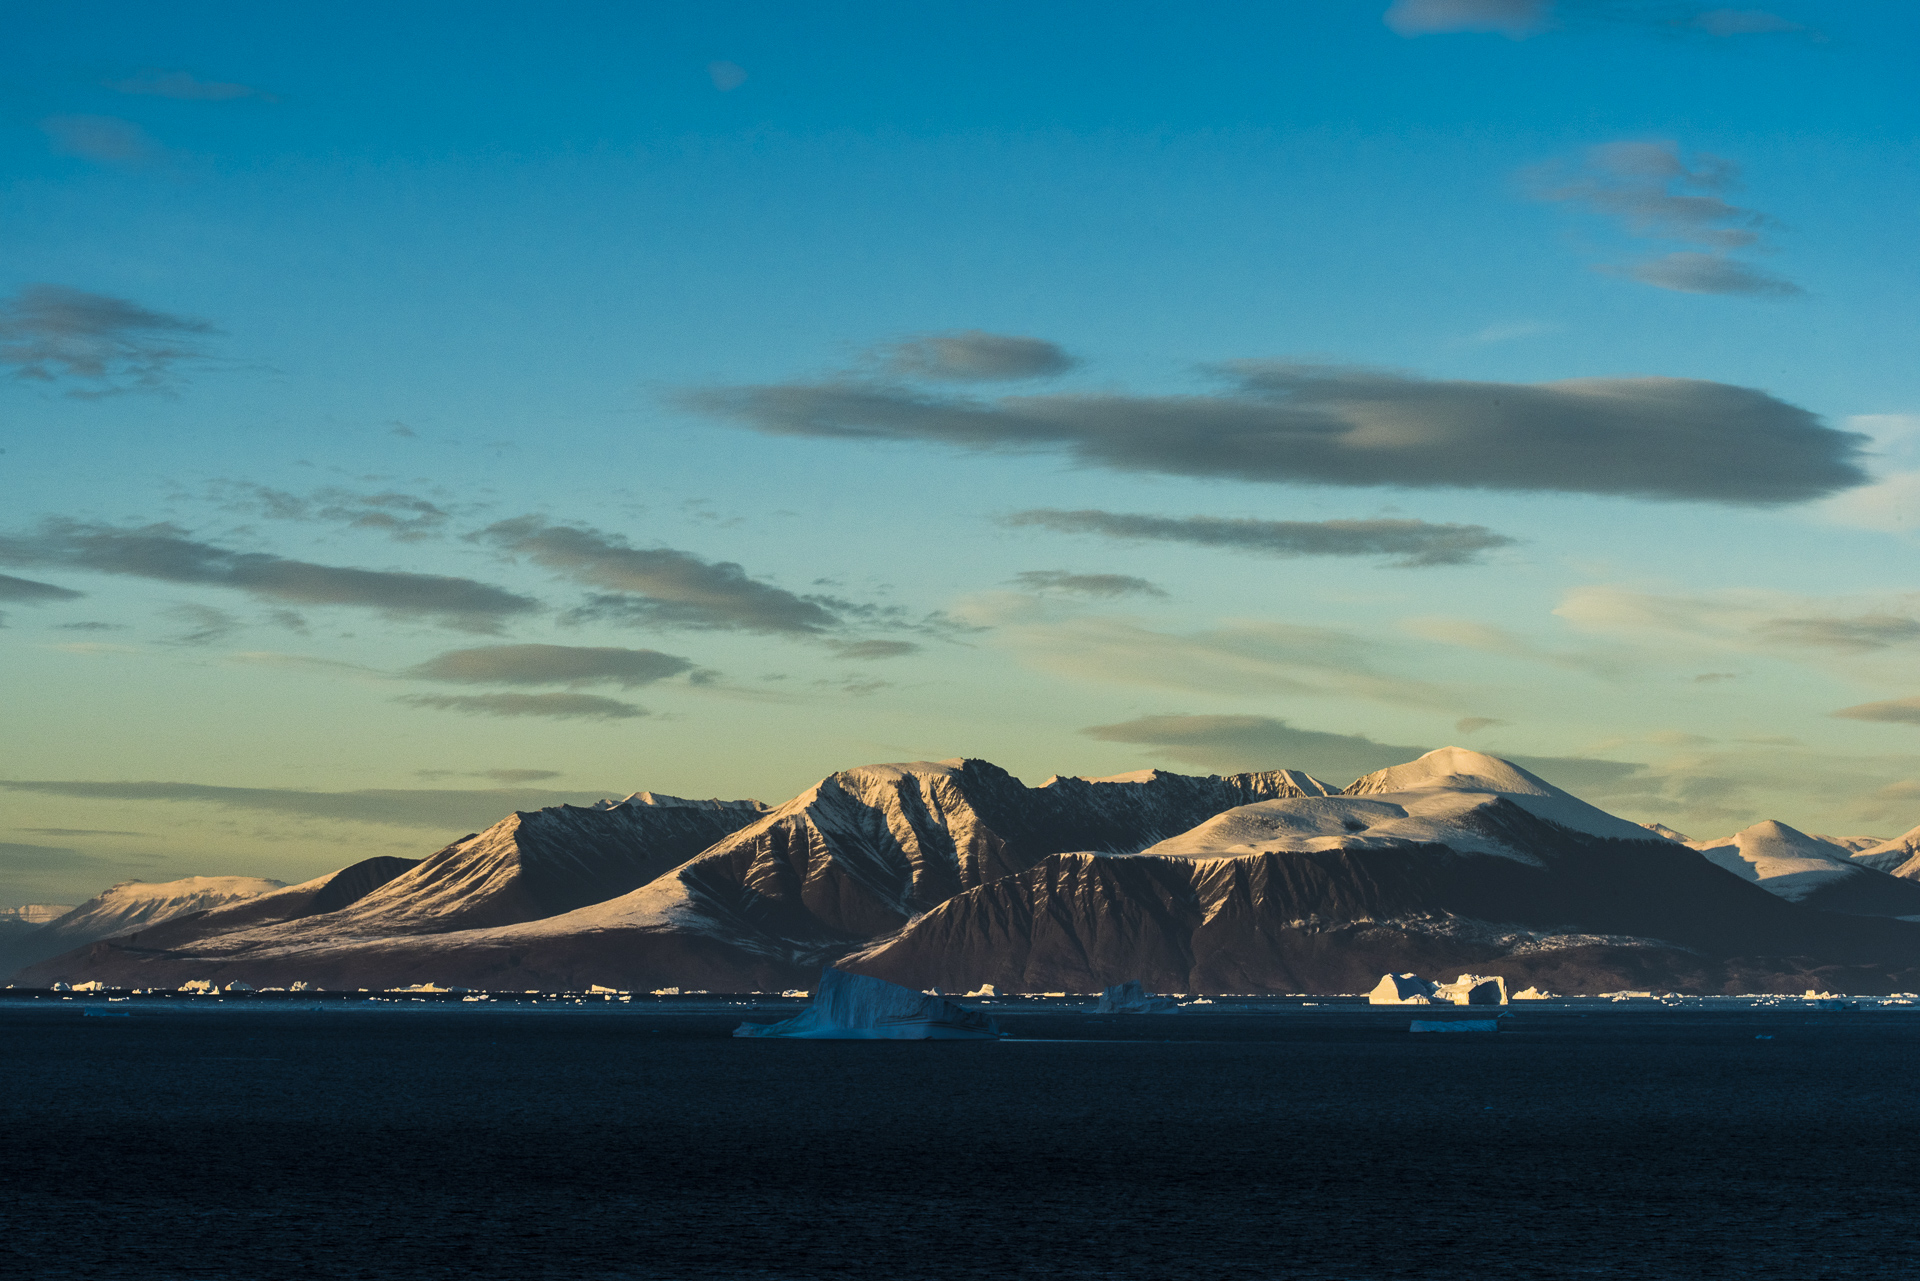 4.Defibaugh_Greenland_Illorsuit_b_2_40.jpg